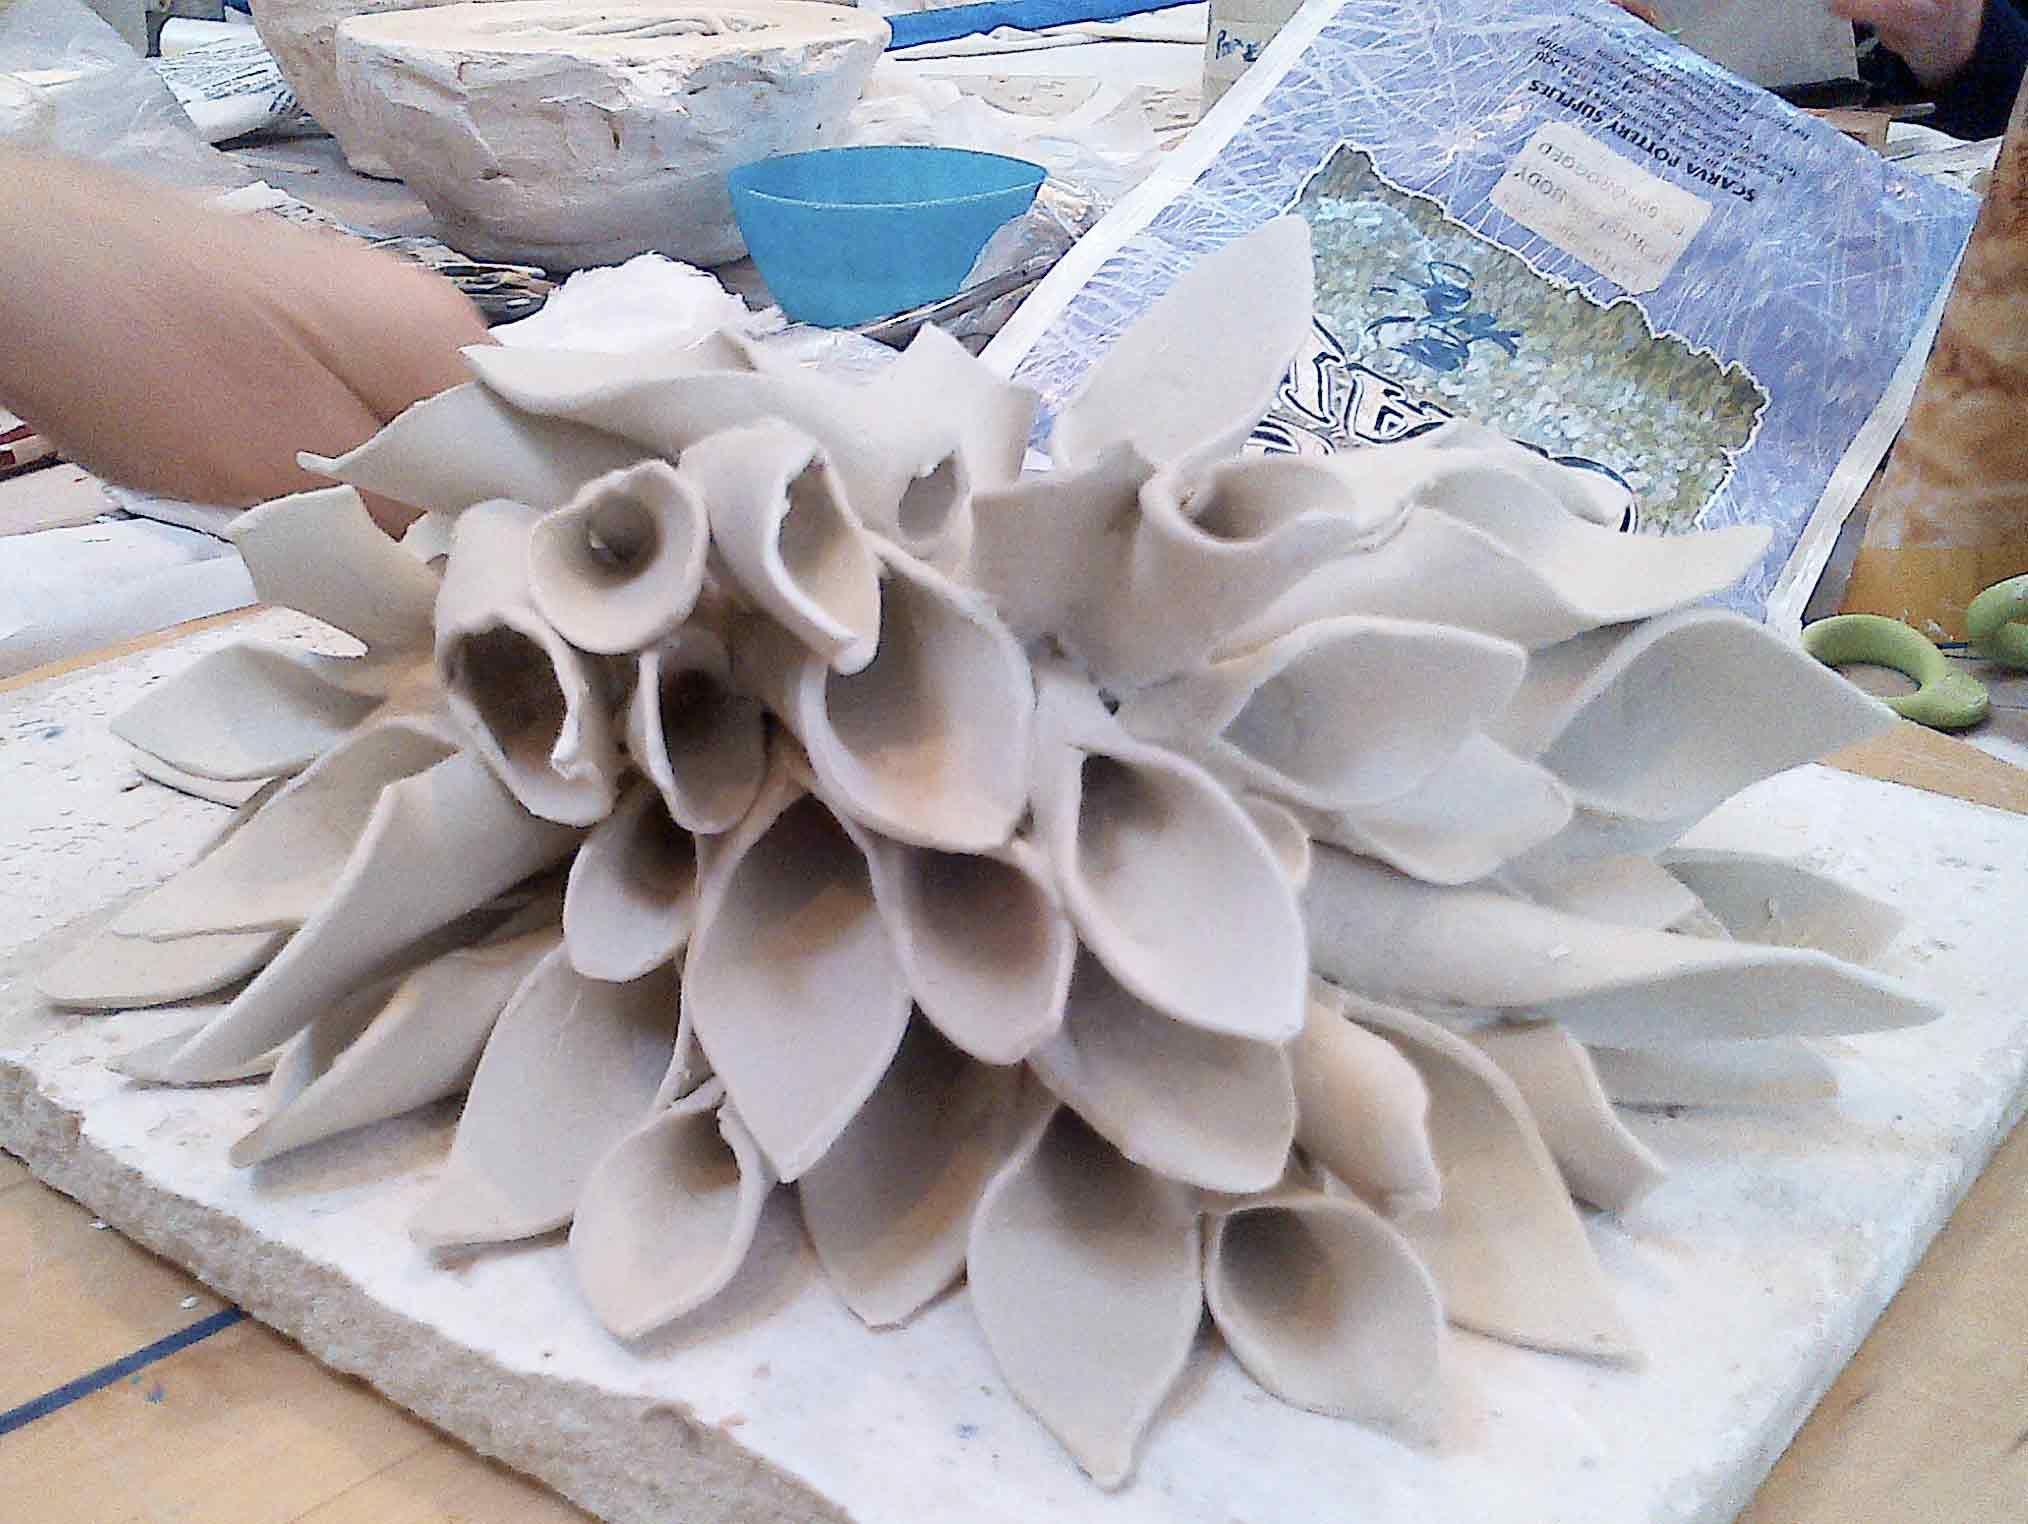 Porcelain sculpture in process by Emily O'Brien - Dublin based ceramic course. www.ceramicforms.com